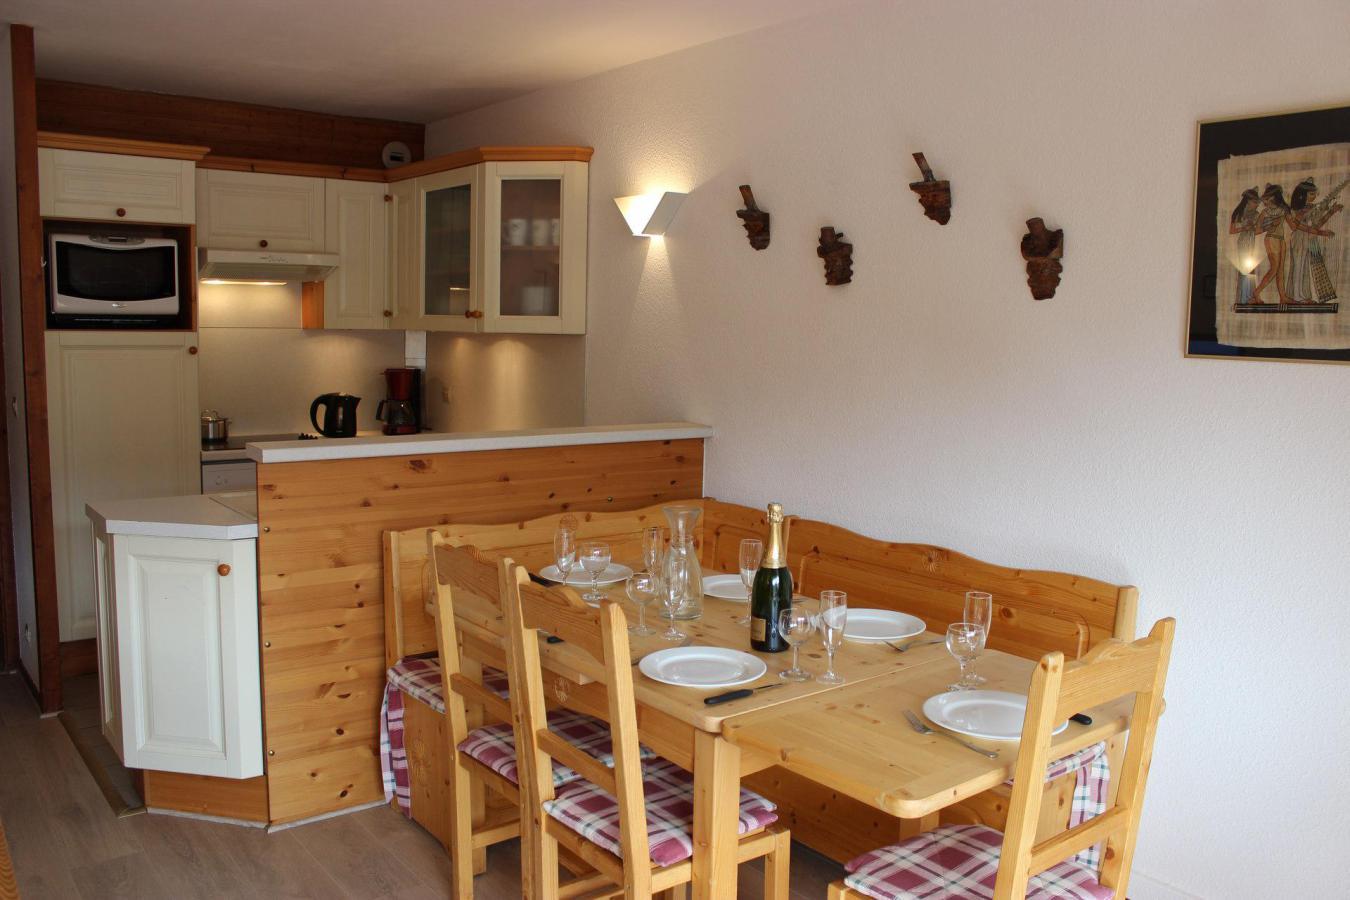 Location au ski Appartement 3 pièces 6 personnes (8) - Residence Beau Soleil - Val Thorens - Coin repas